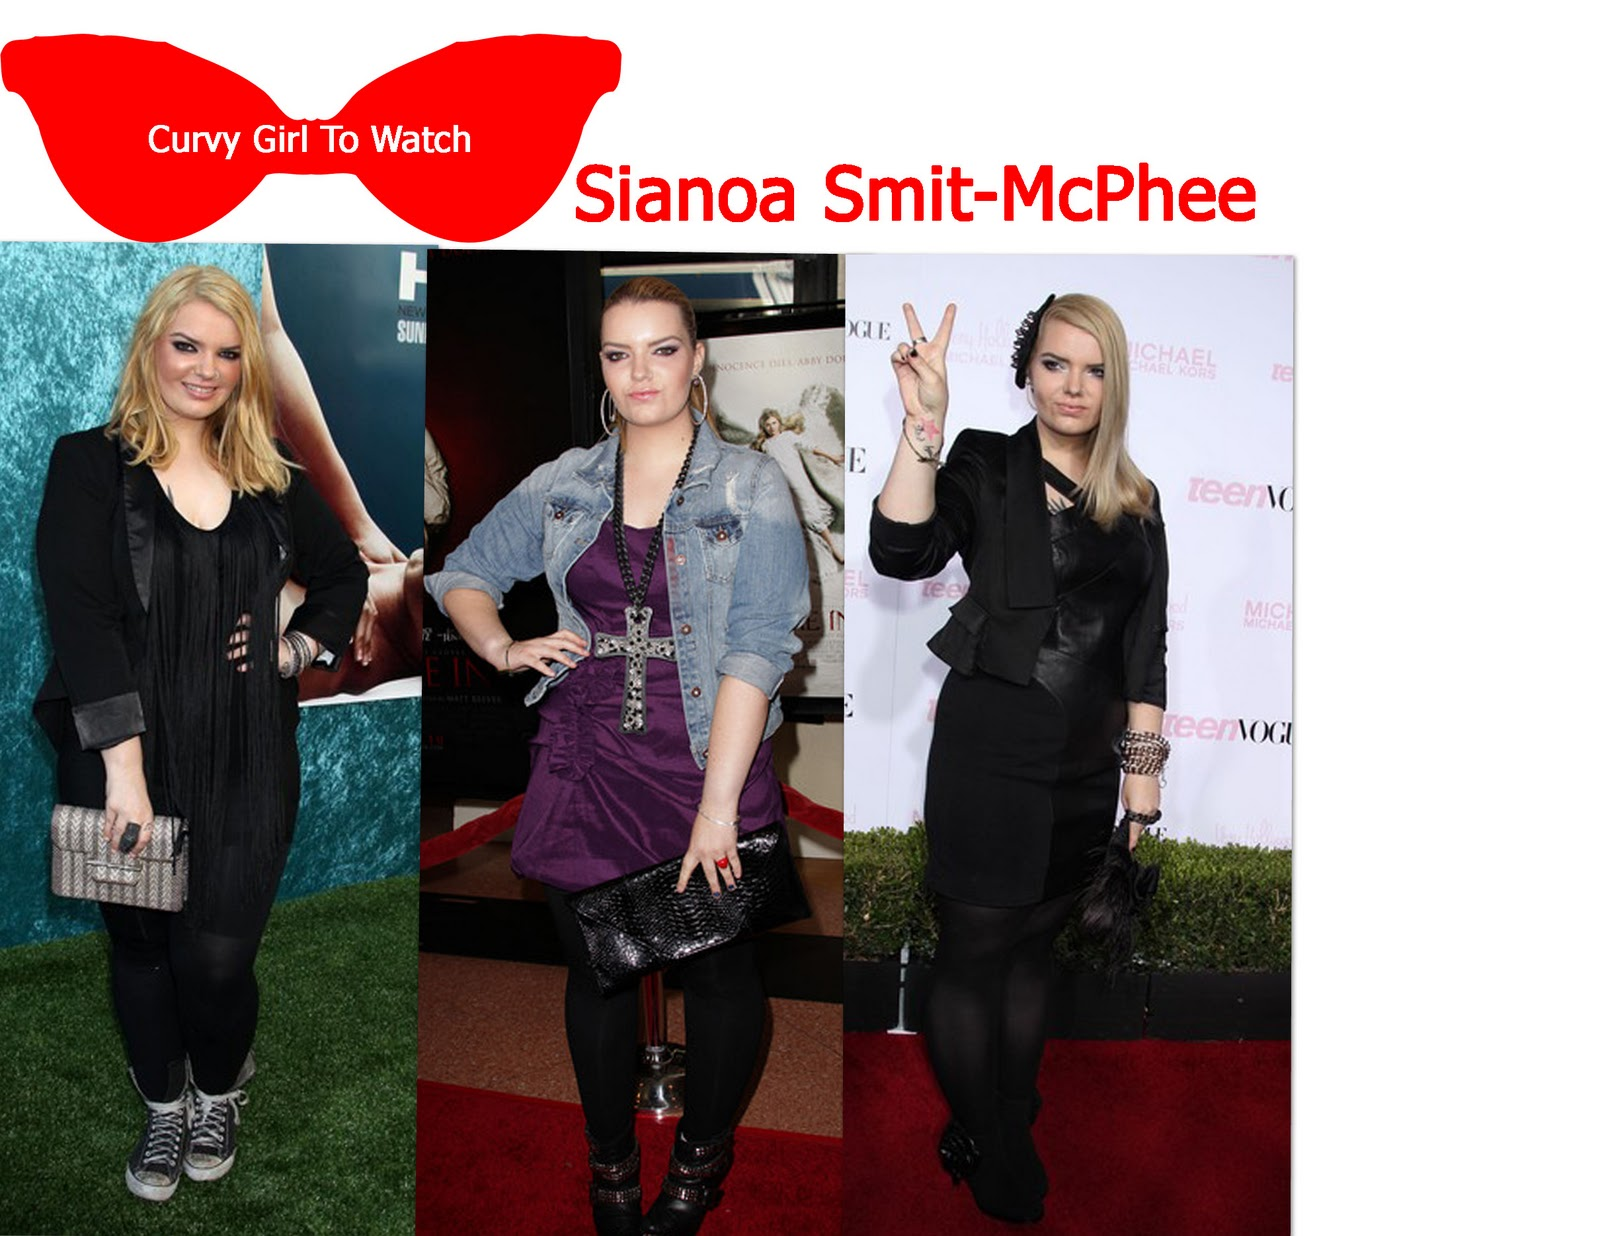 Sianoa Smit-McPhee